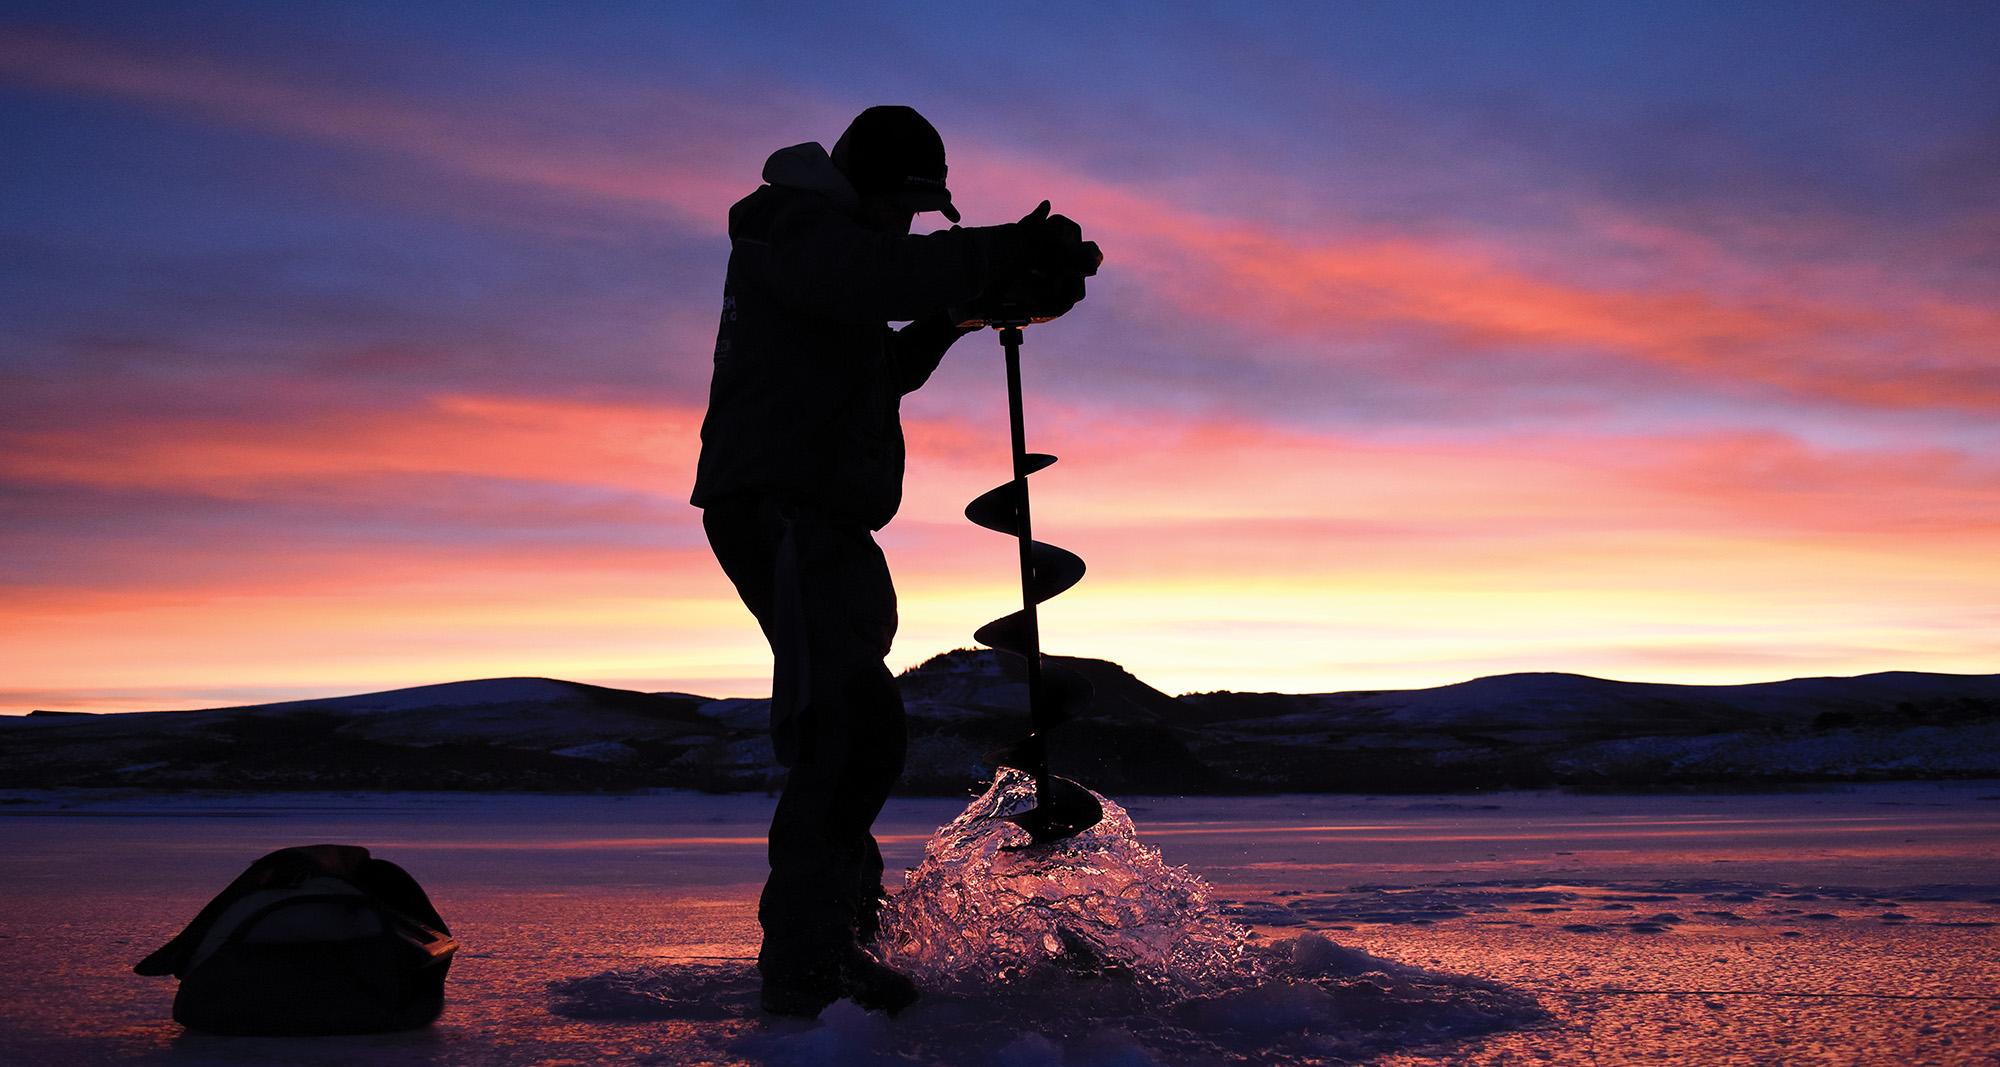 Tyler Stephen Werner Ice fishing